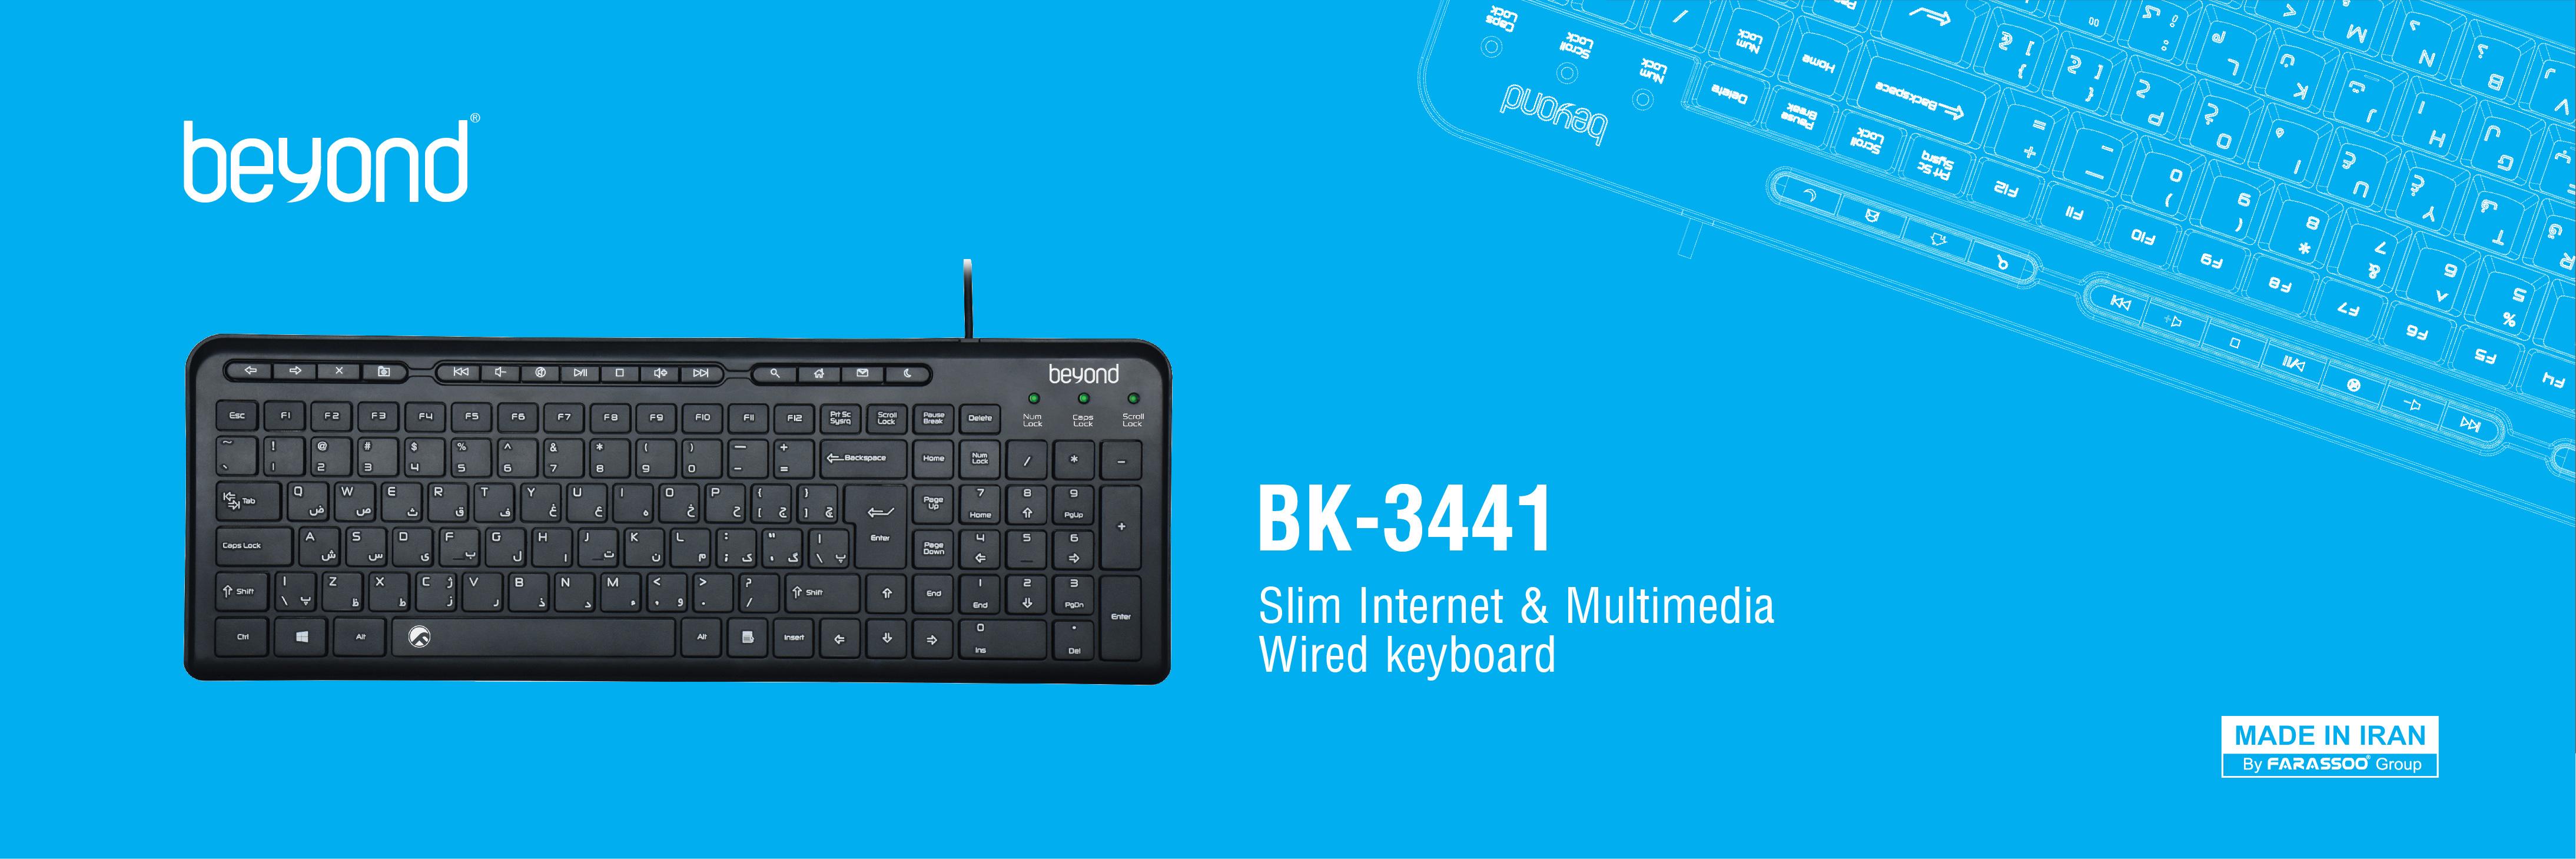 BK-3441